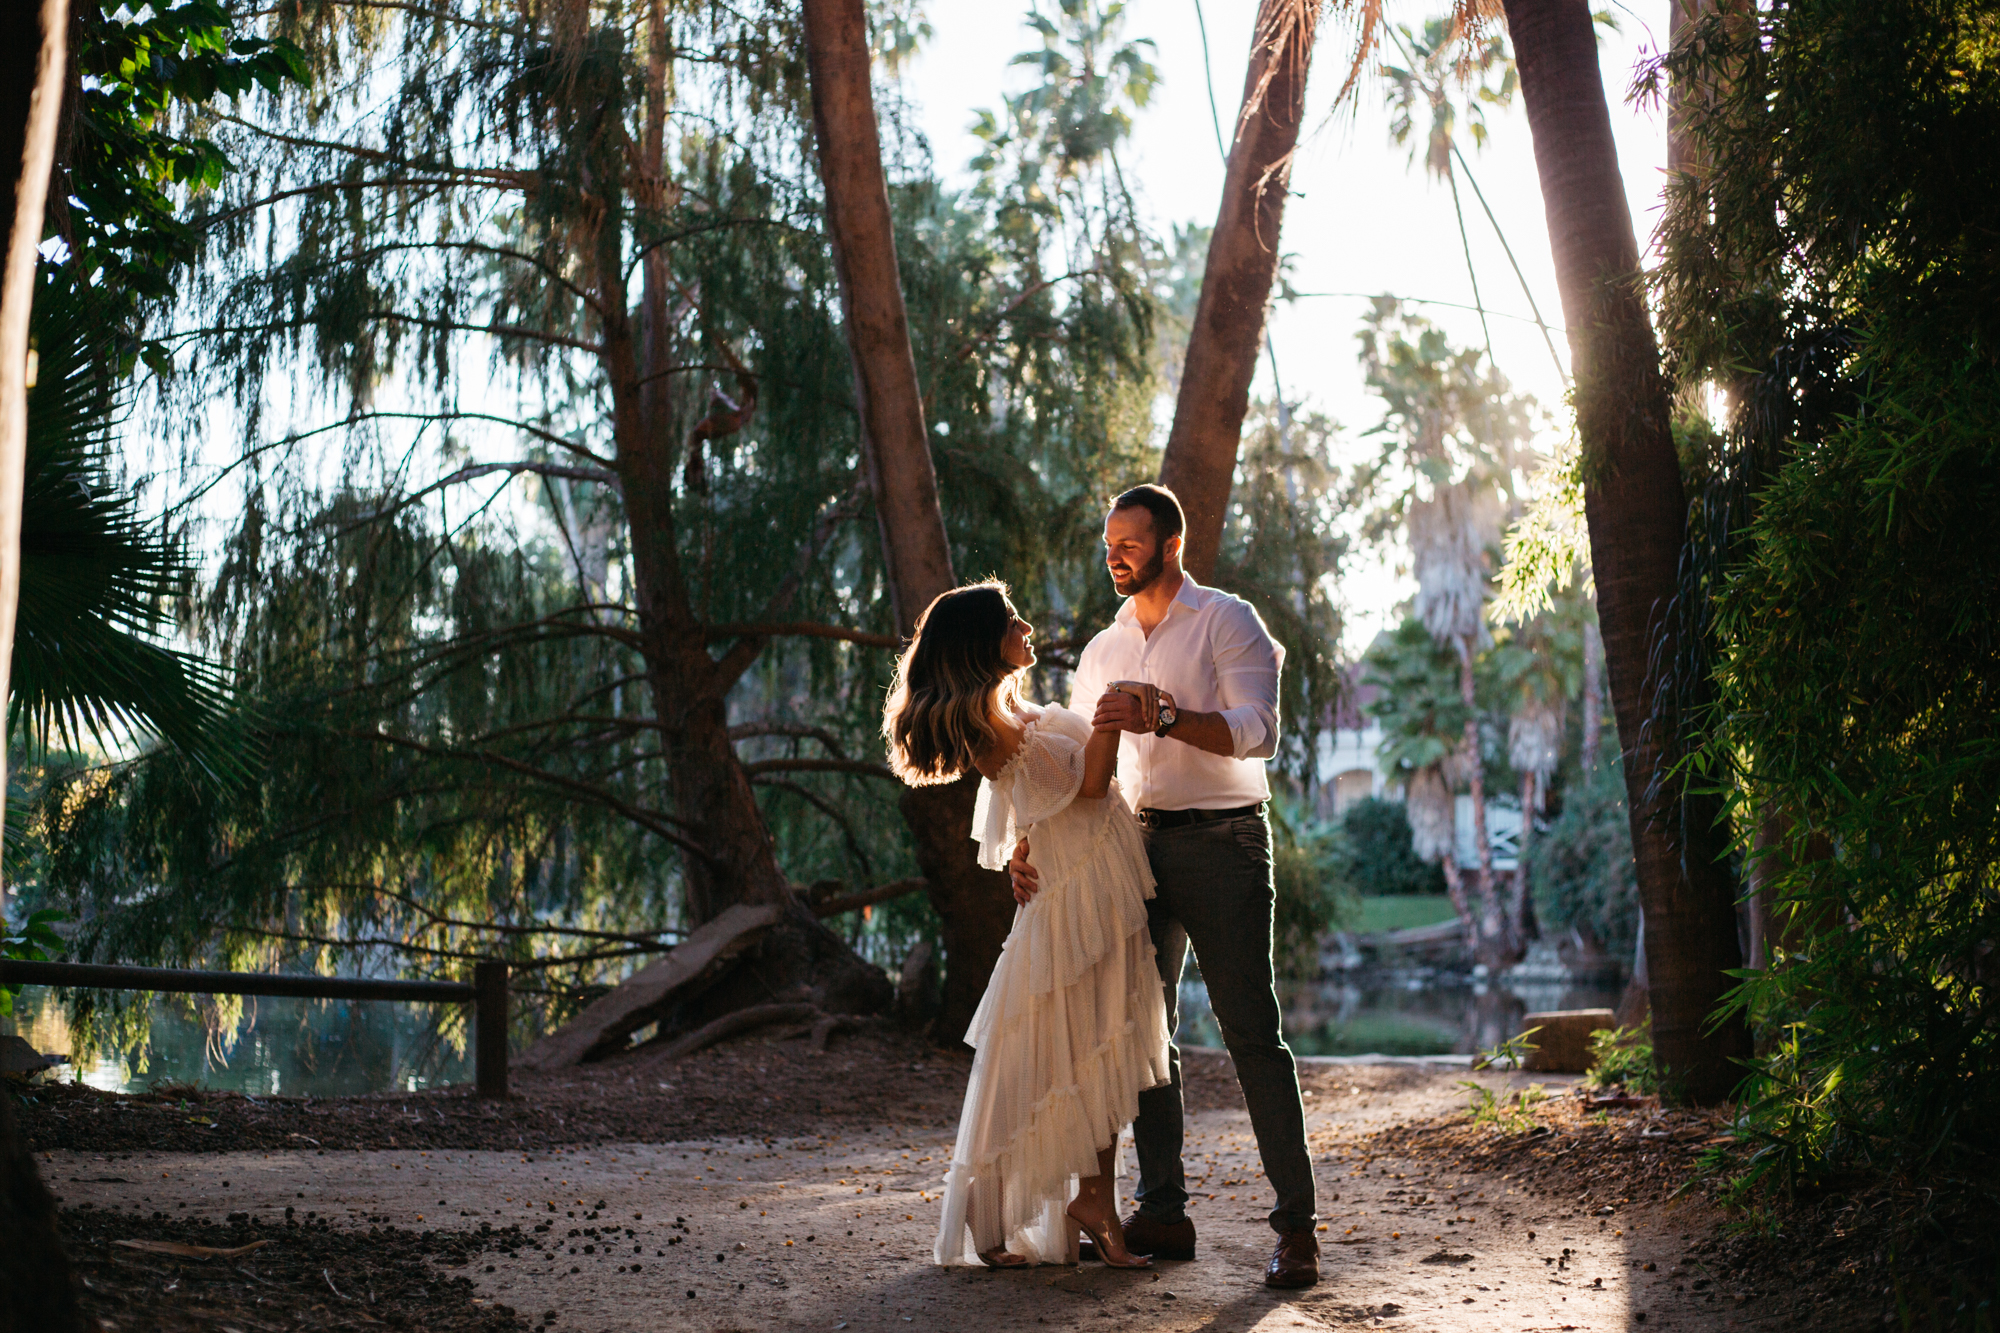 021-2018-LA-arboretum.jpg